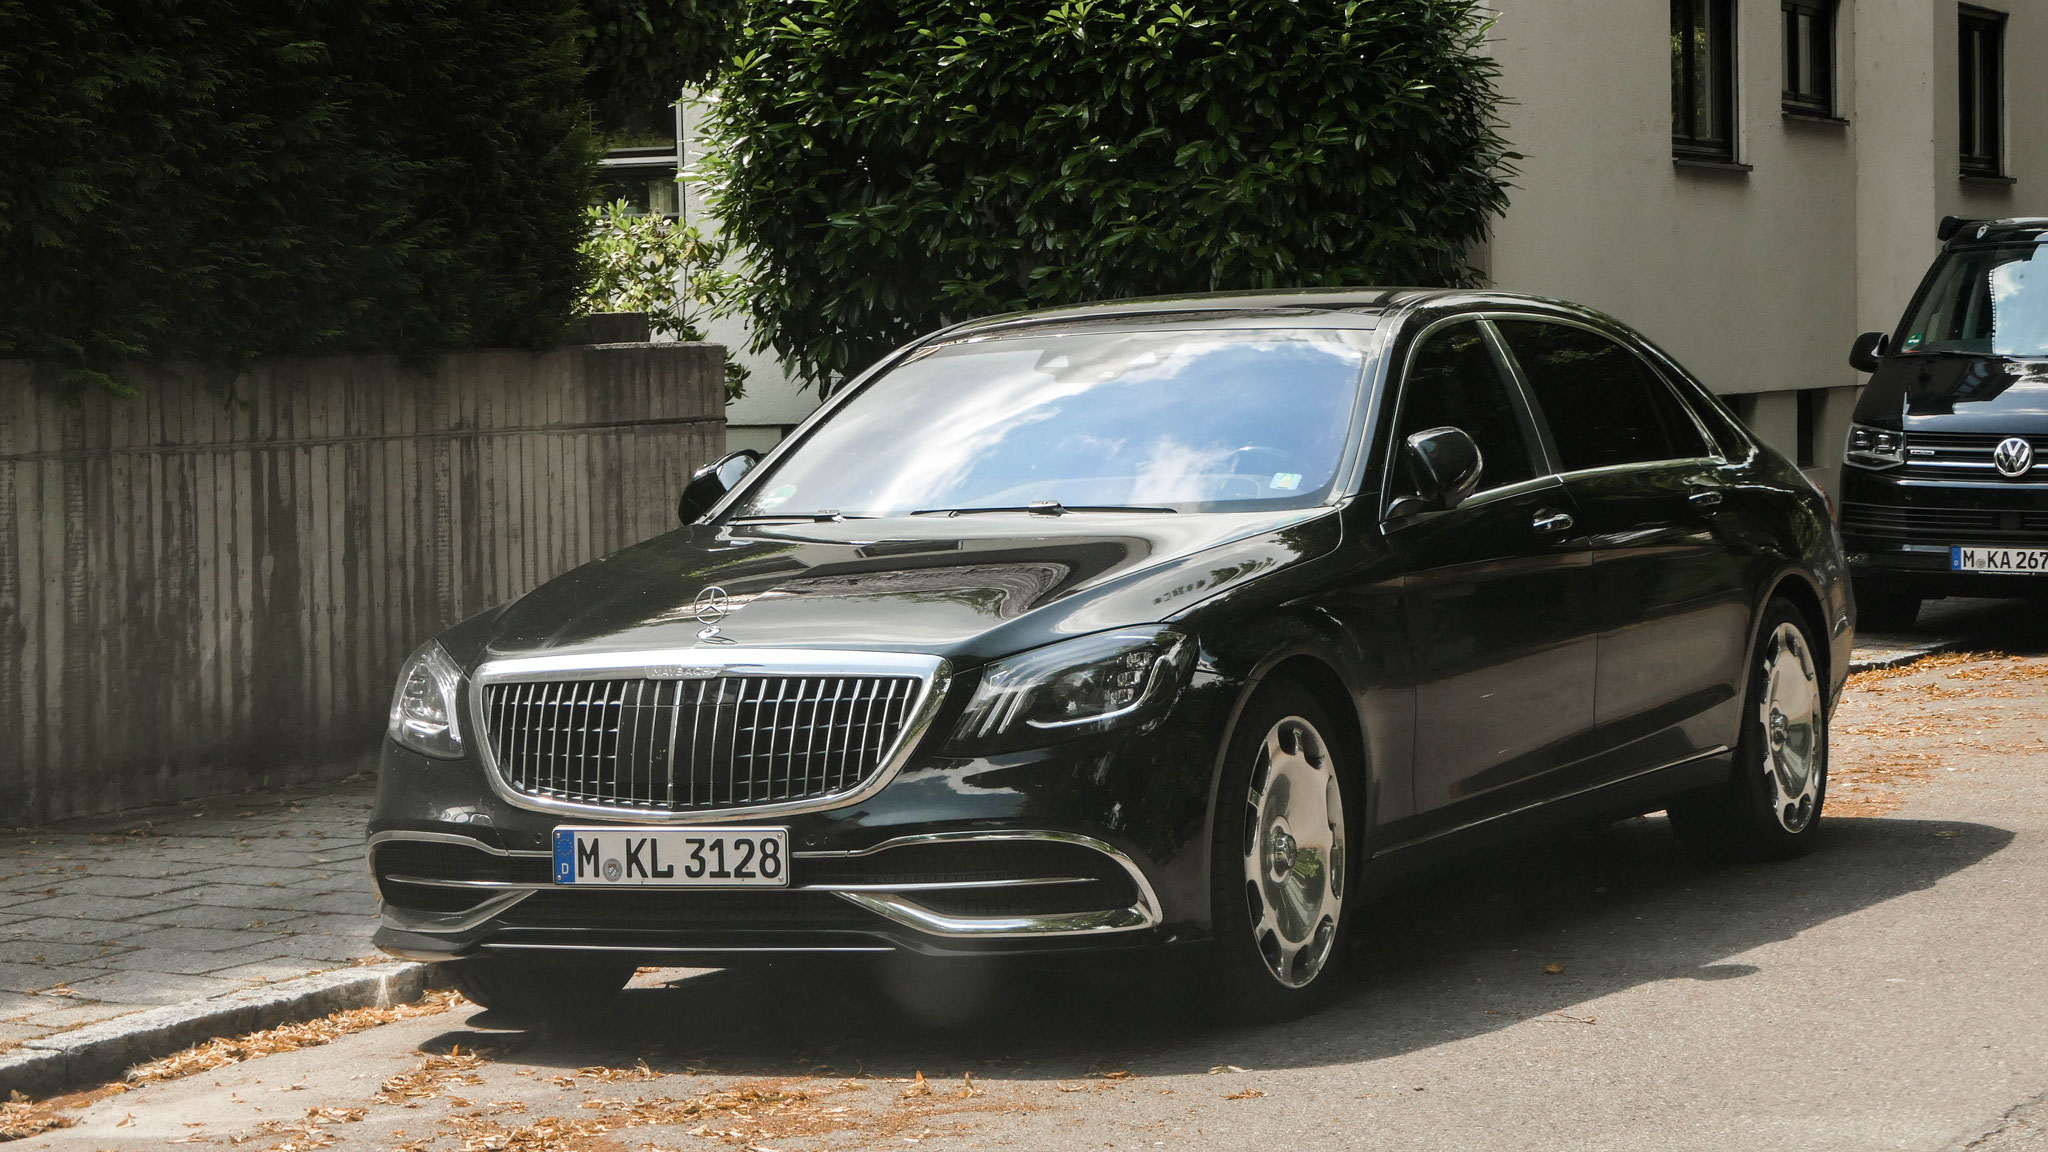 Mercedes Maybach S500 - M-KL-3128